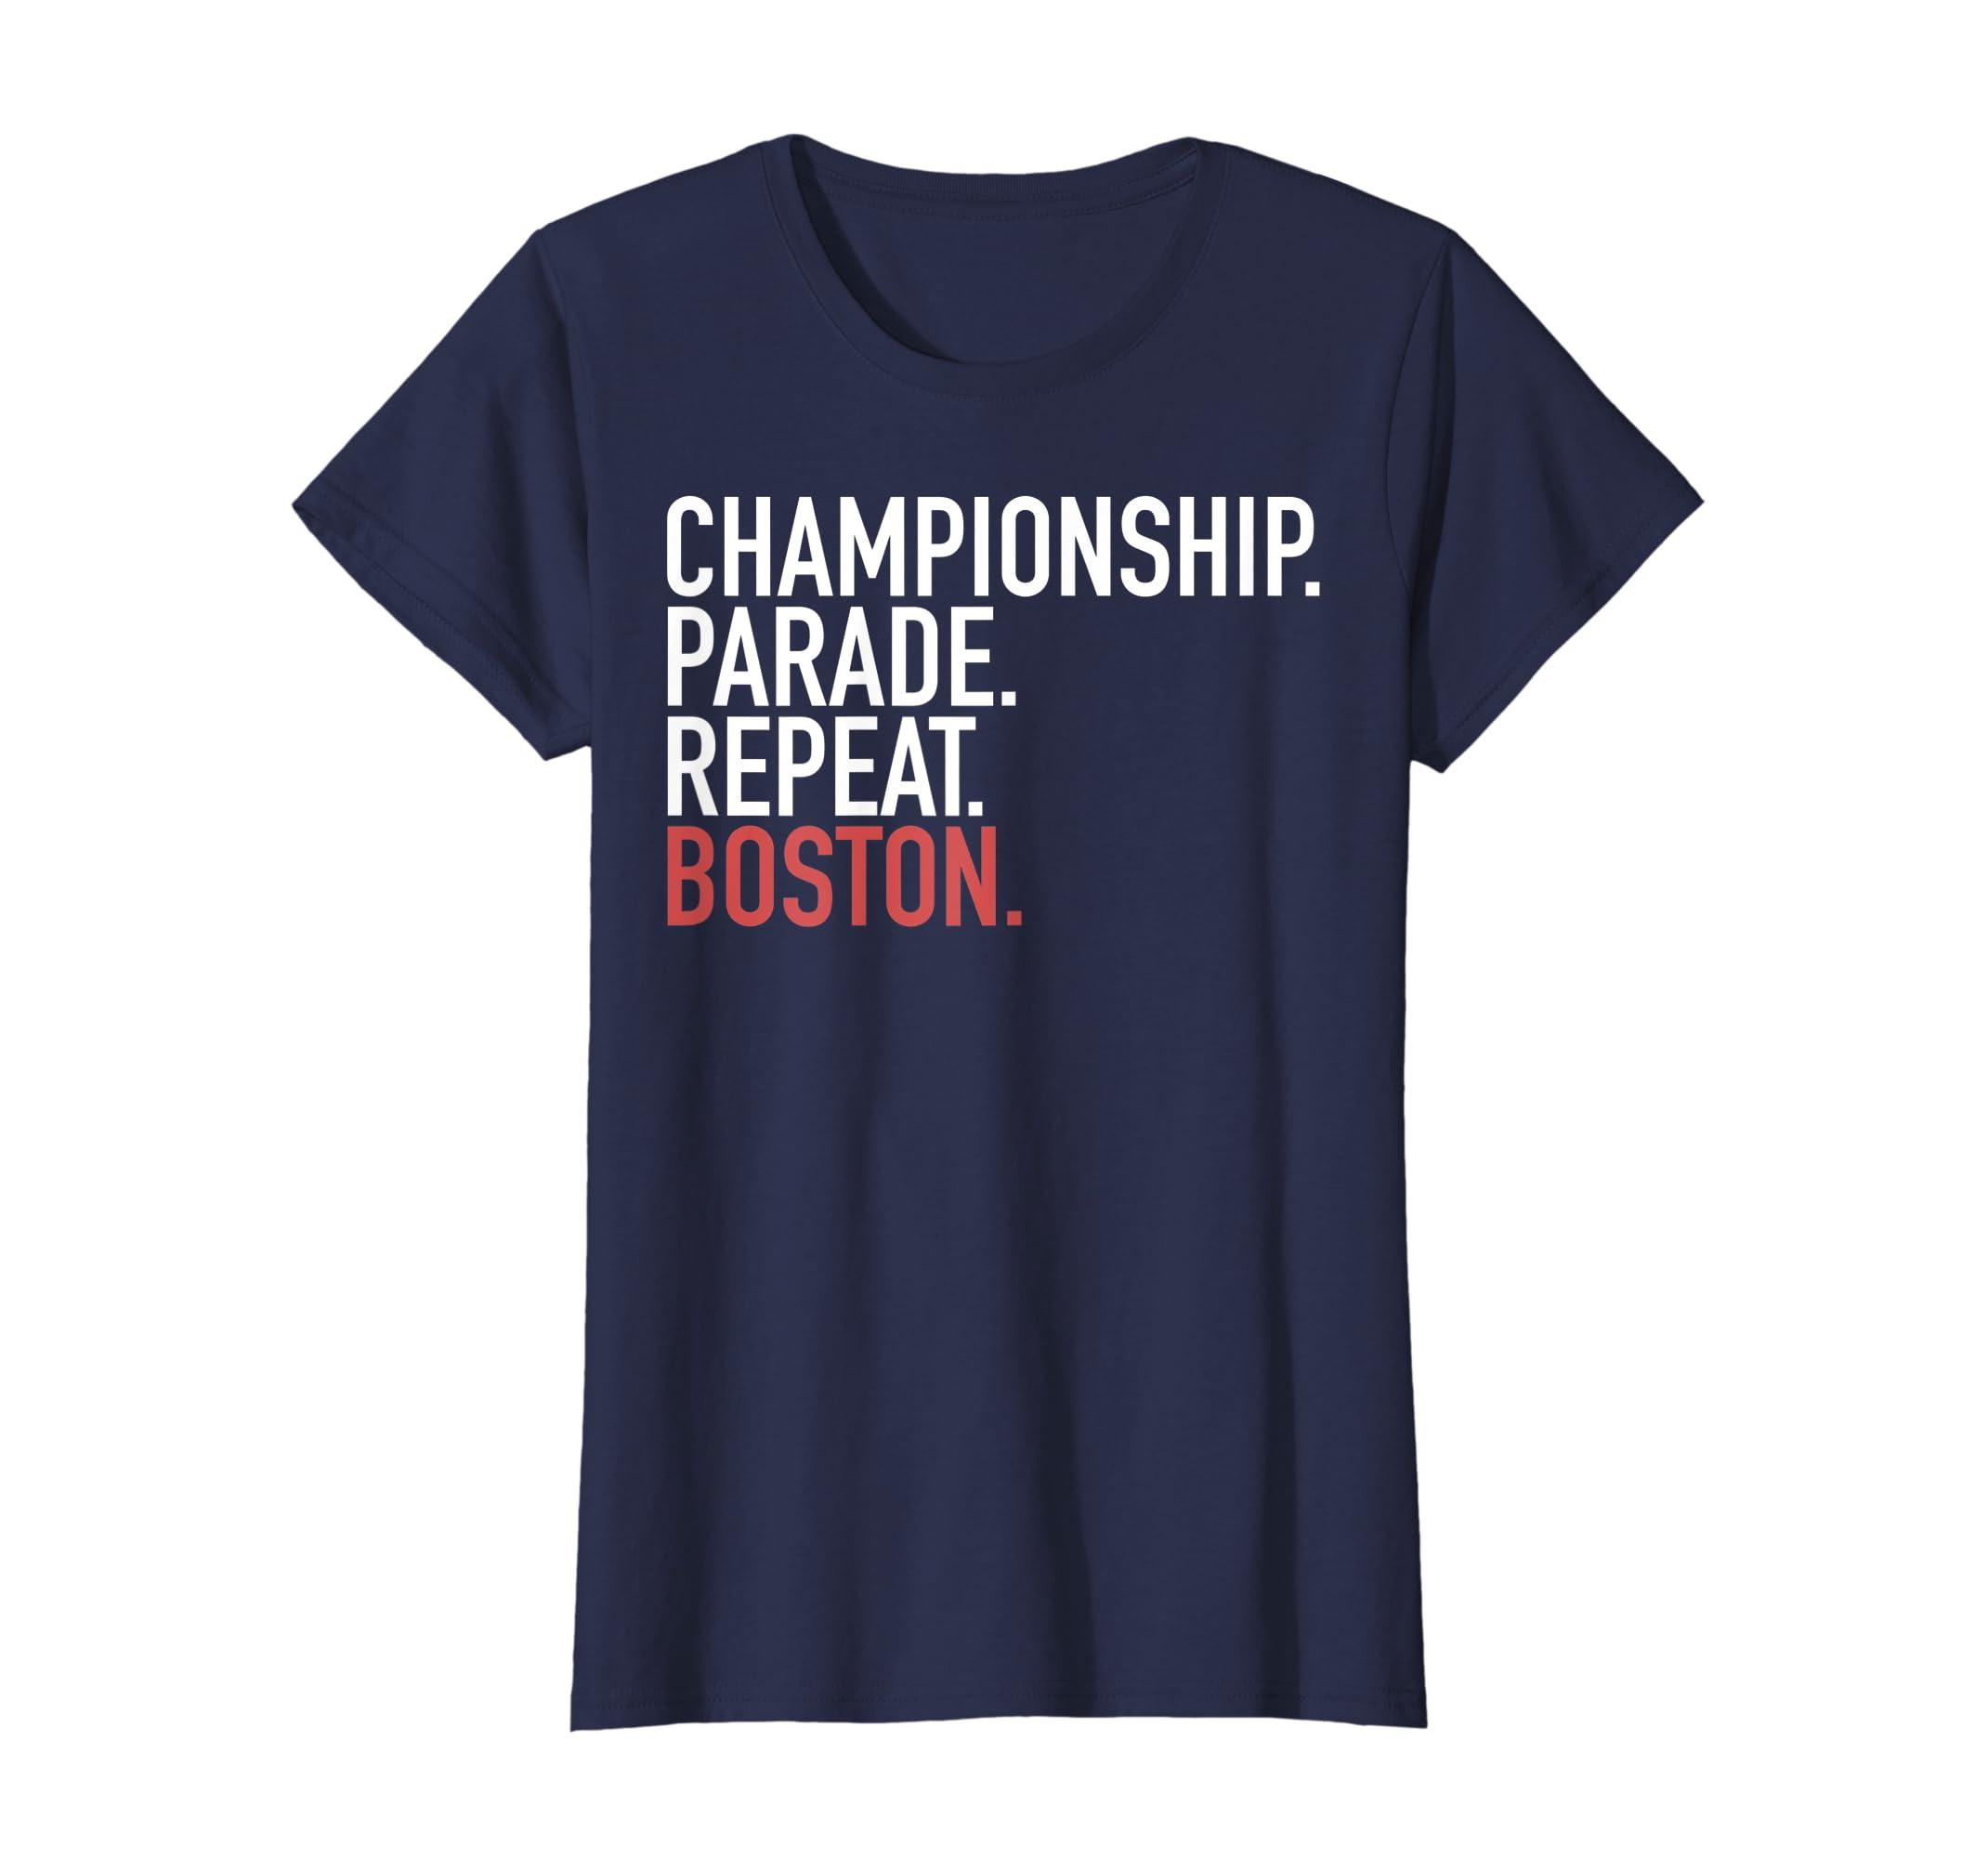 3afdd0da344e Amazon.com: Championship Parade Repeat Boston T-Shirt: Clothing